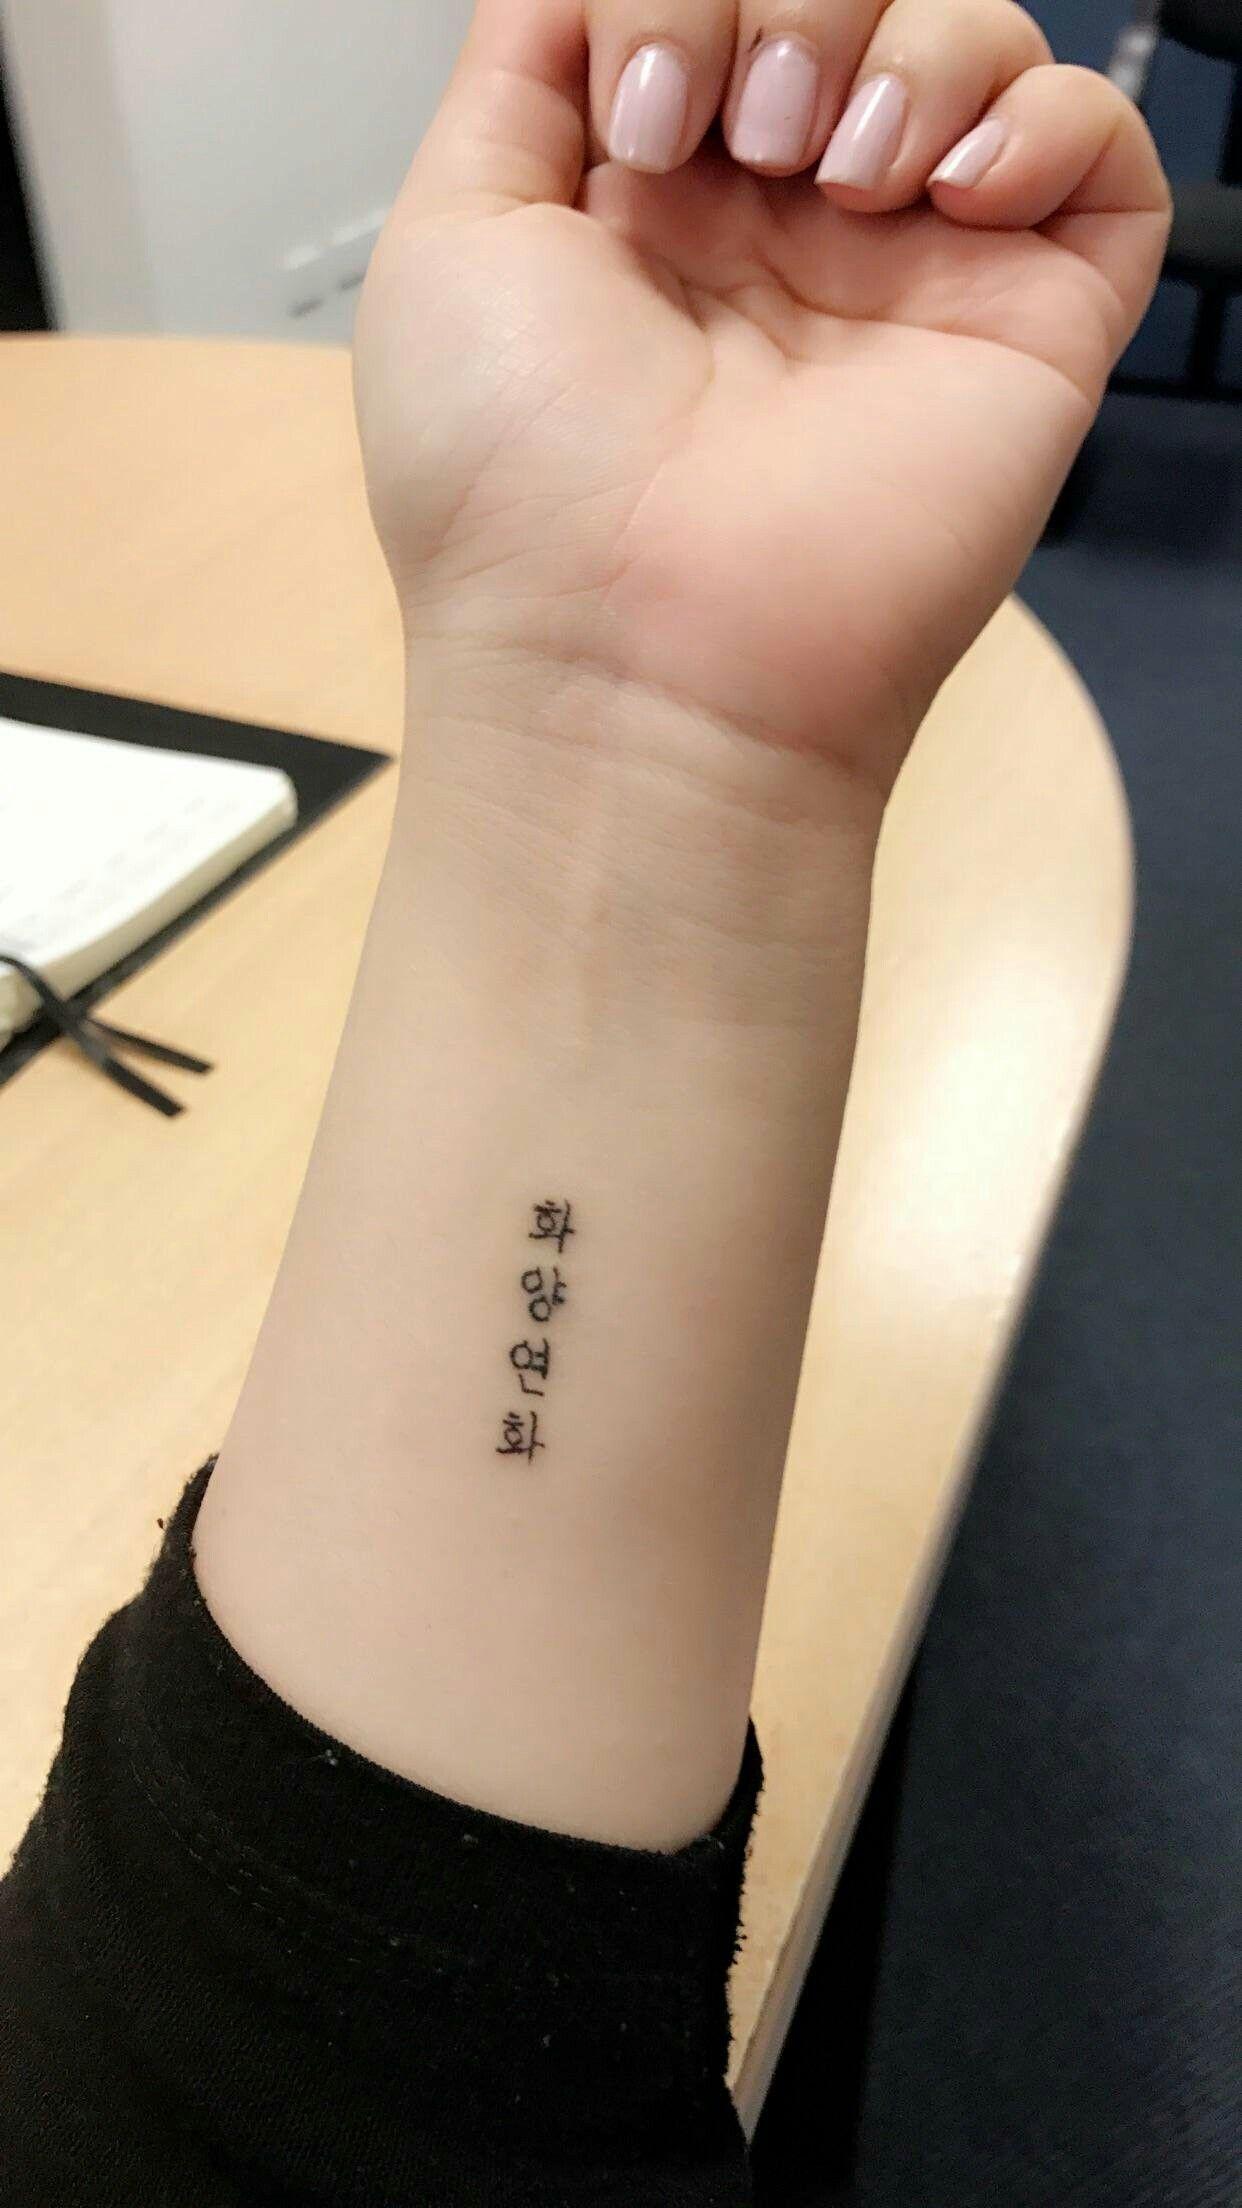 Pin by sky !! on BeeTeaEs Kpop tattoos, Tattoos, Bts